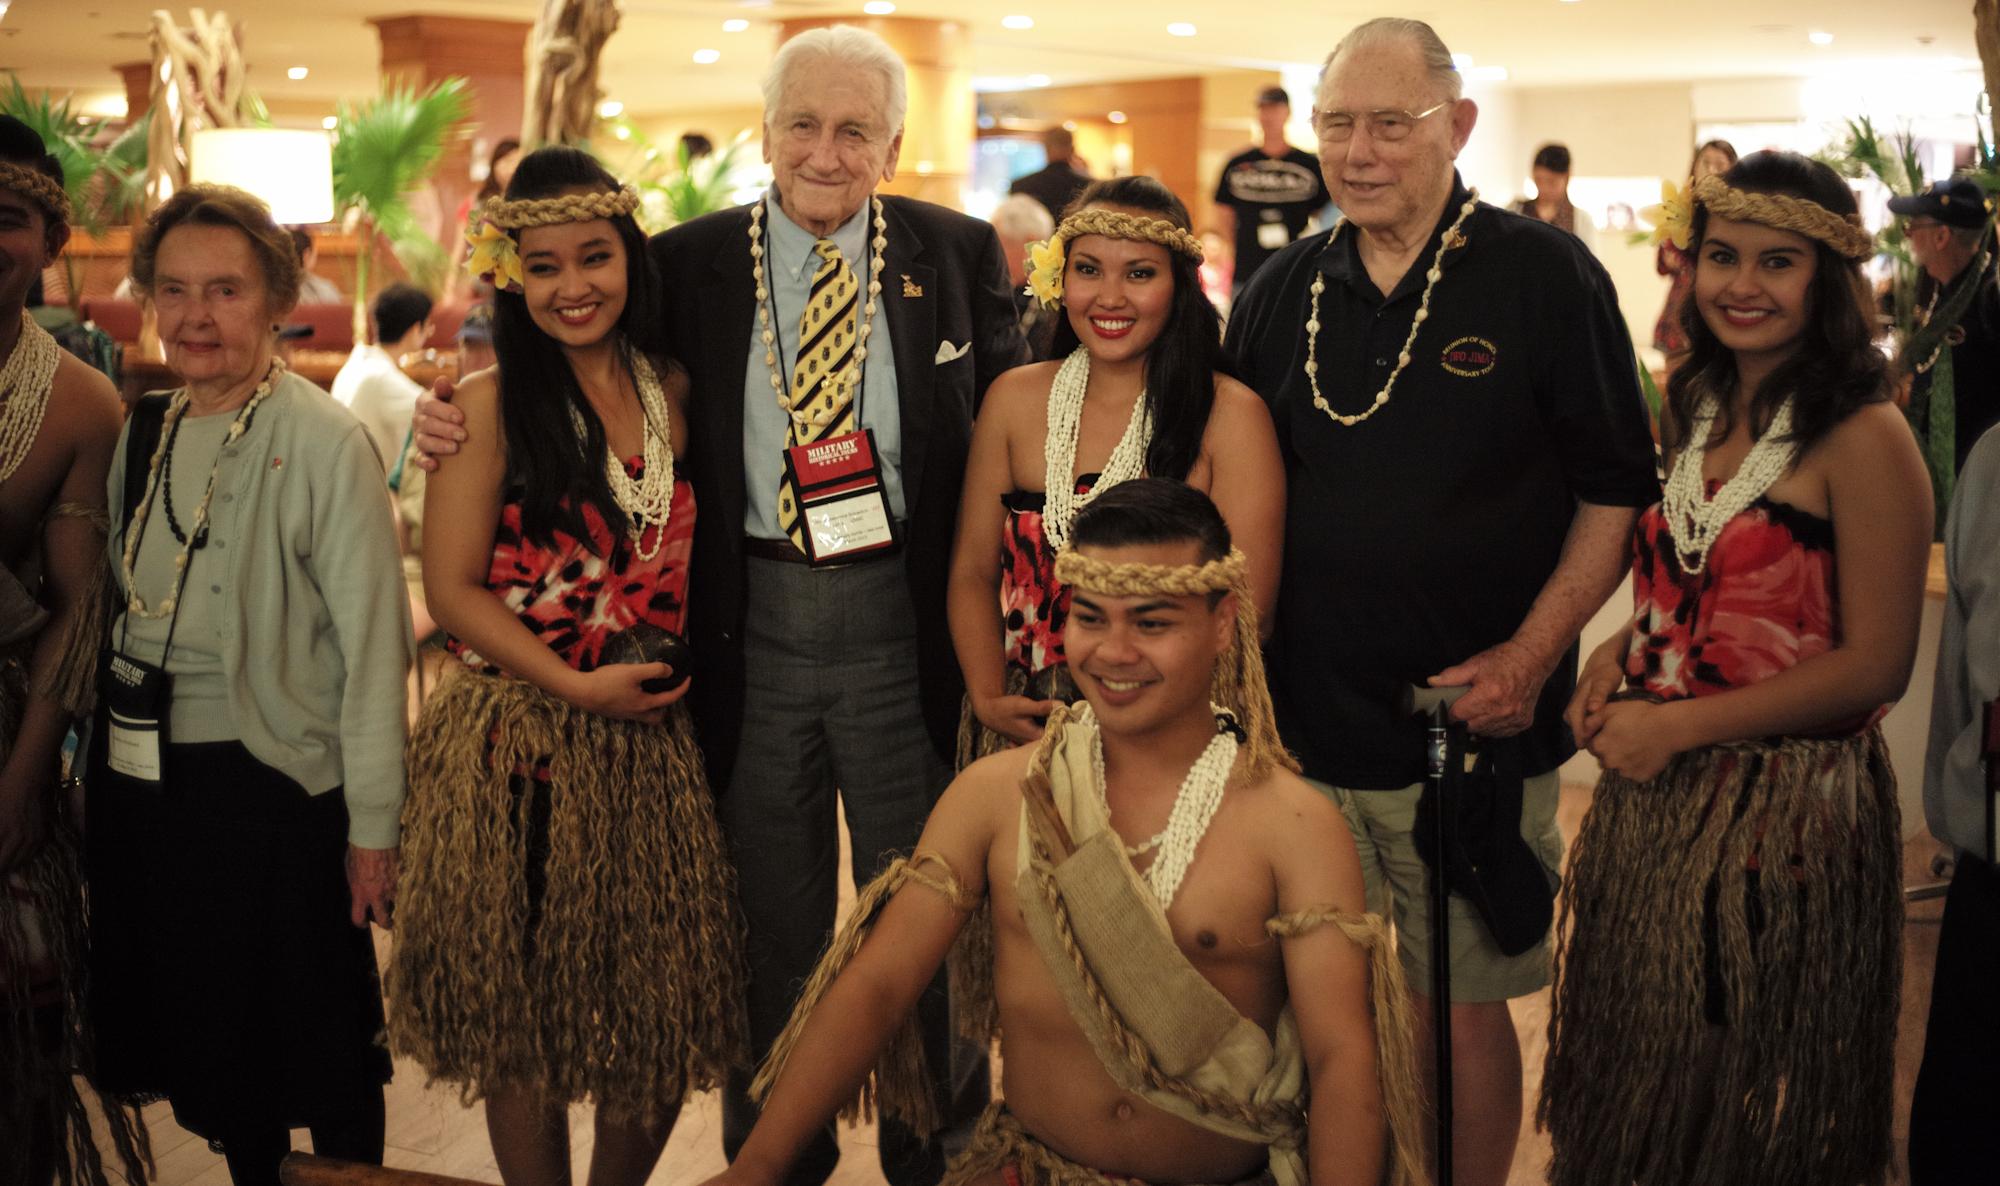 Hafa Adai! The traditional Chamorro (Guam) welcome